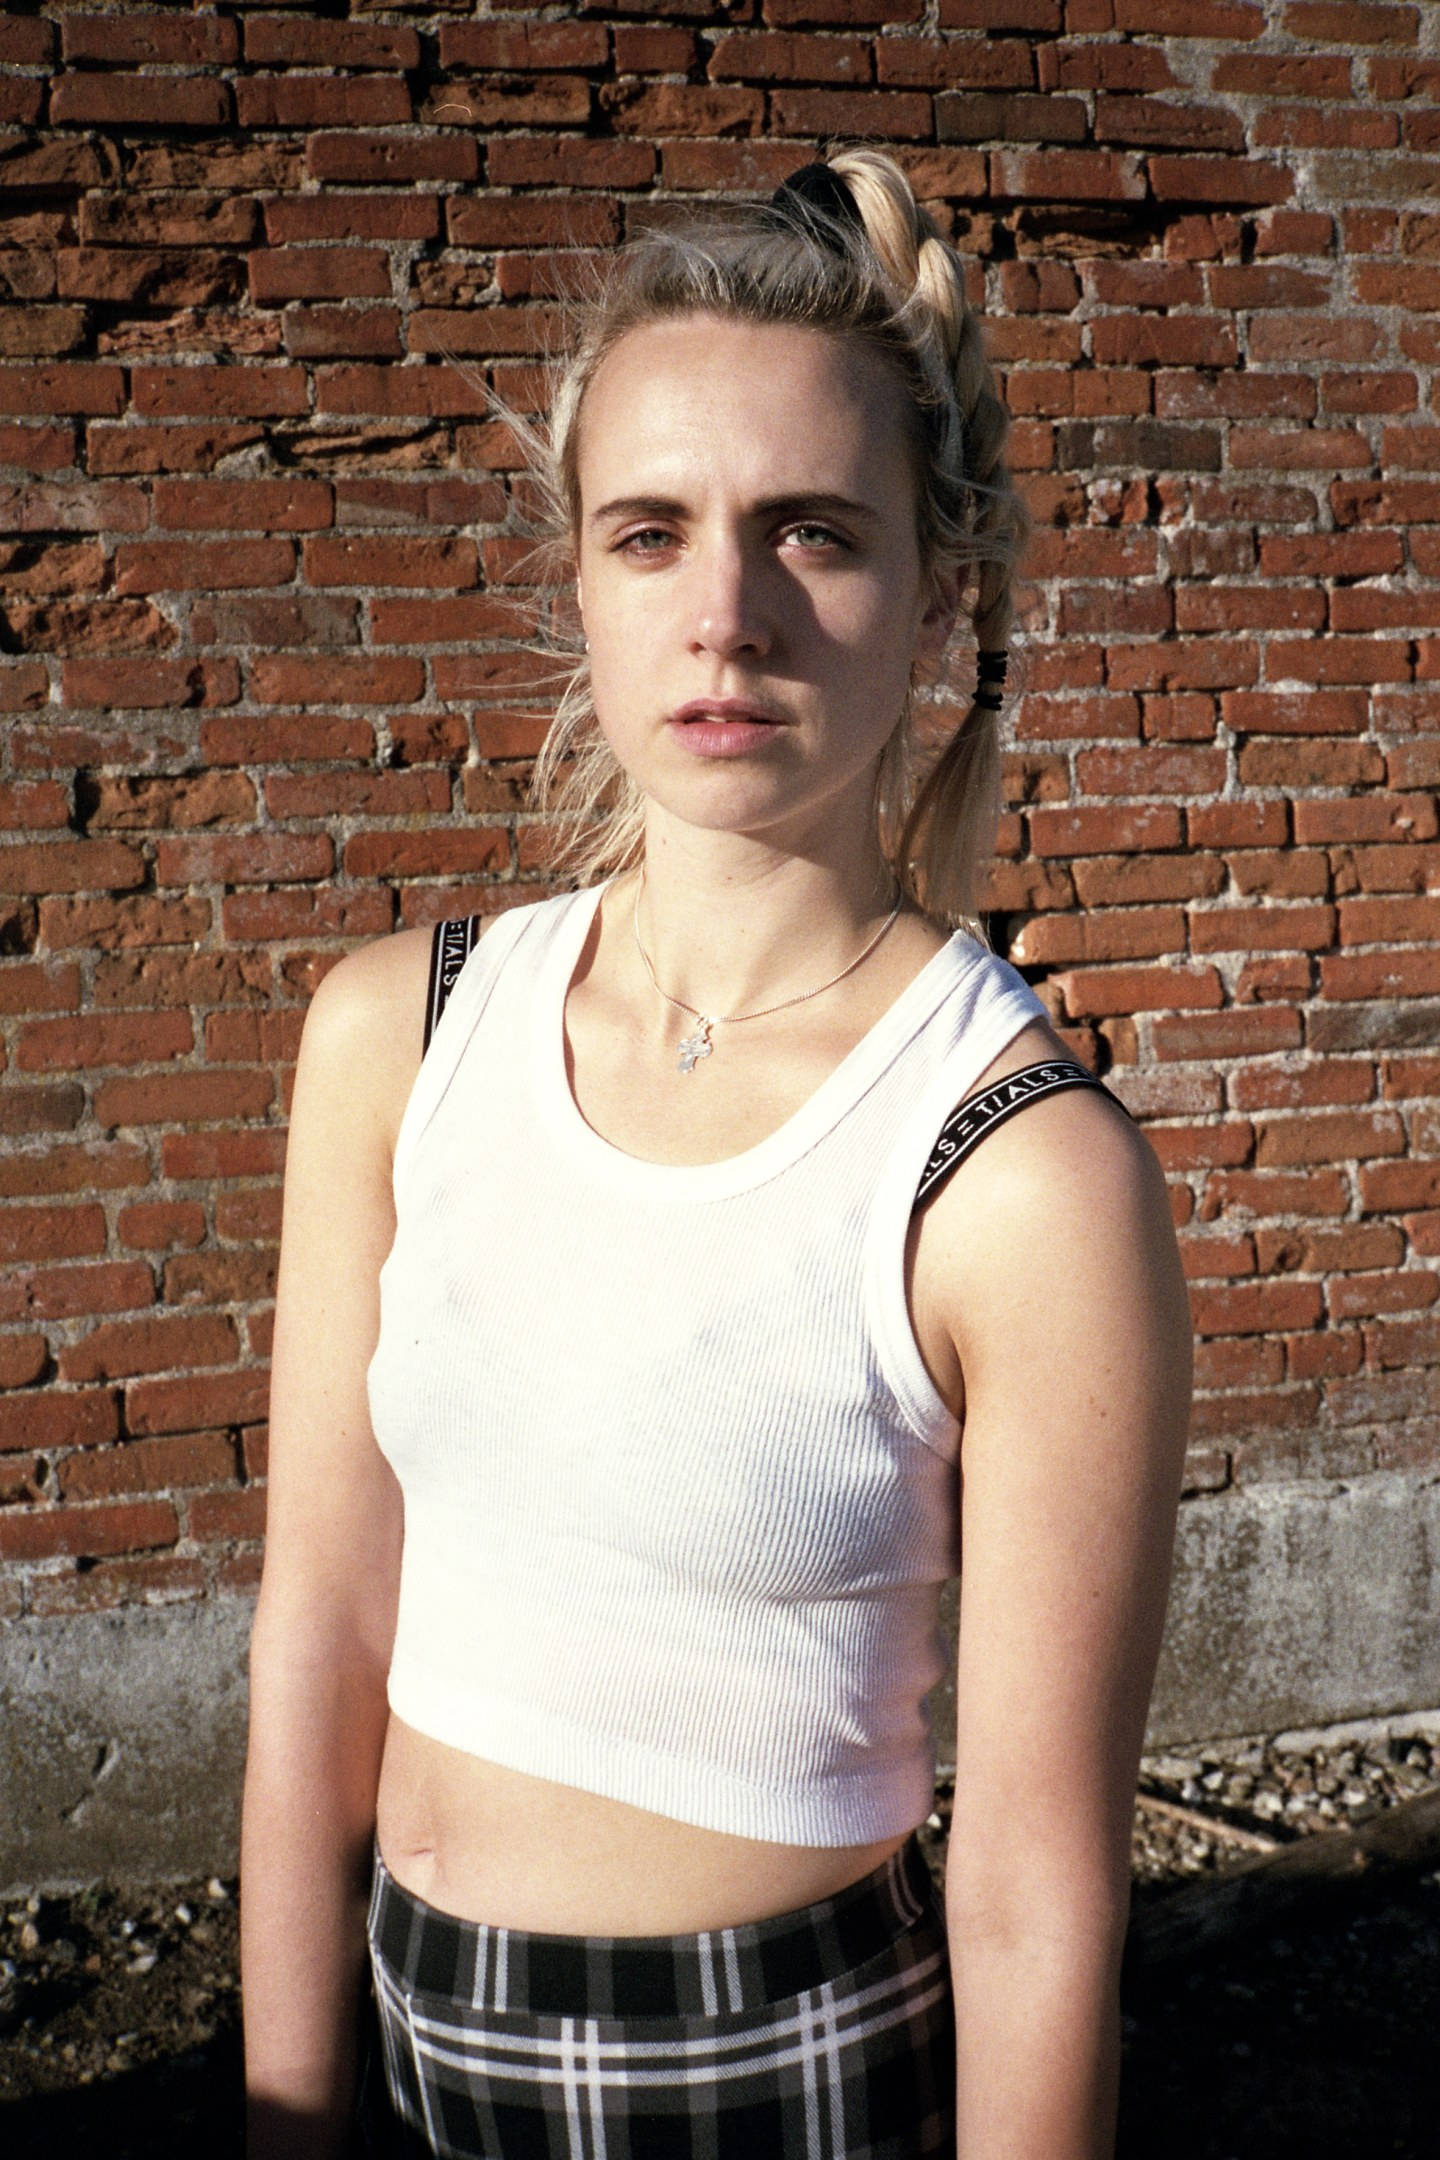 How Mø Finessed Anarchist Punk Life Into Global Pop Stardom